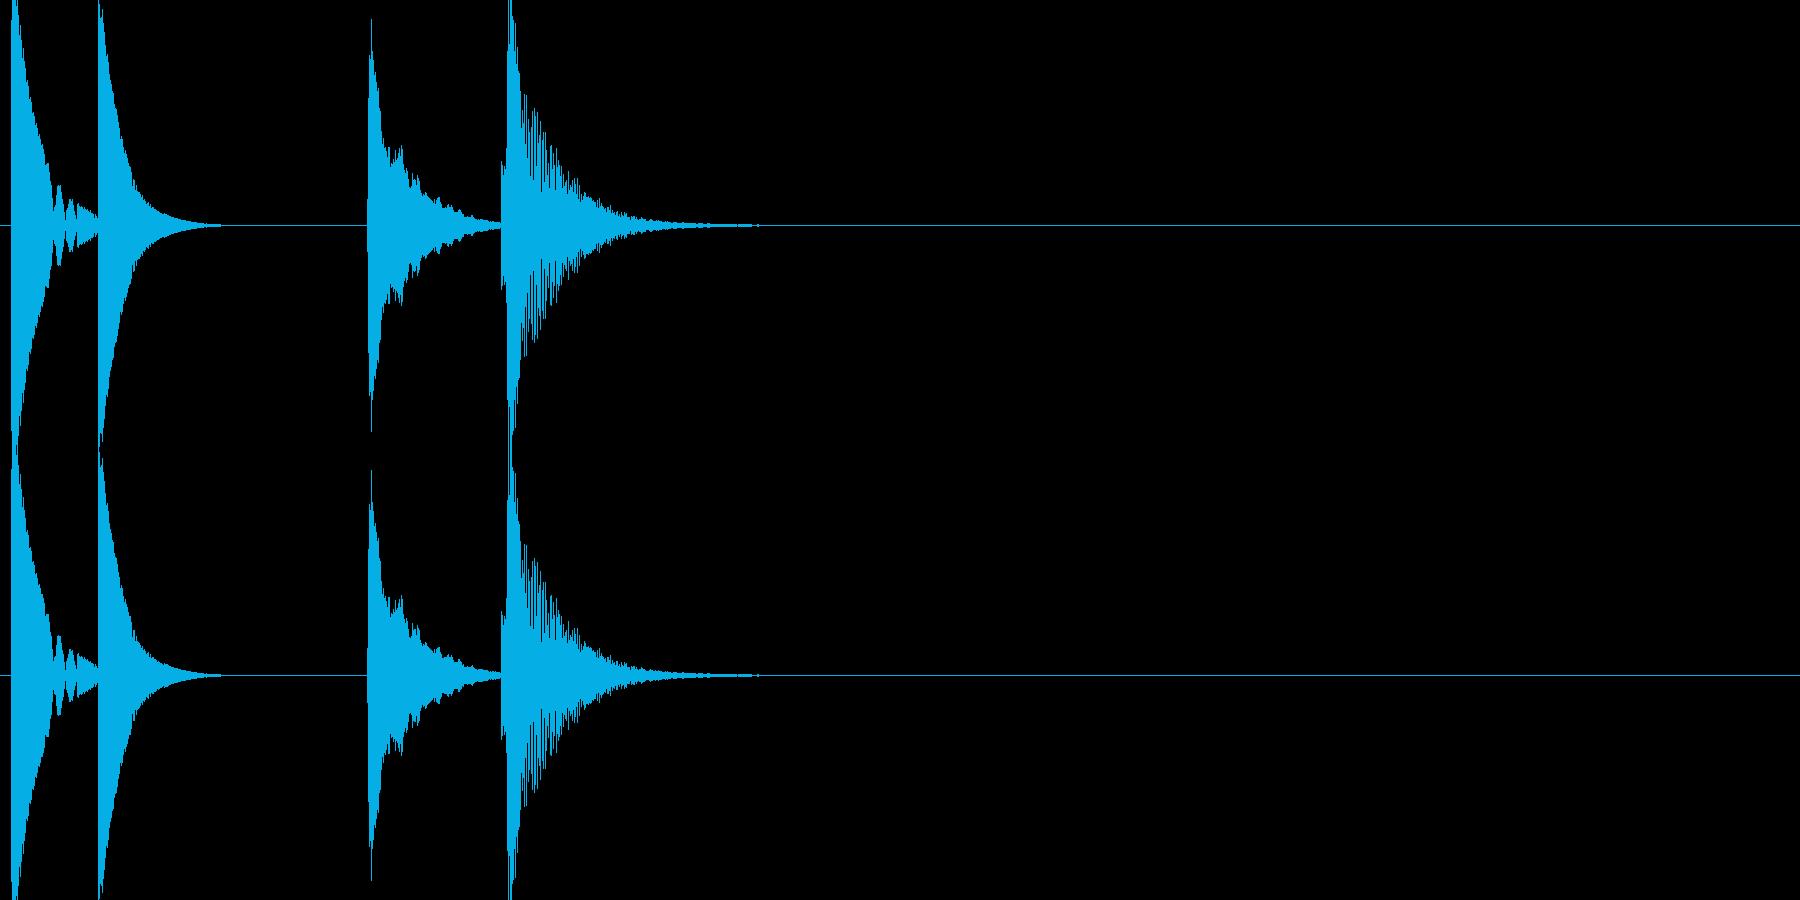 KANTペコパコンアイキャッチの再生済みの波形